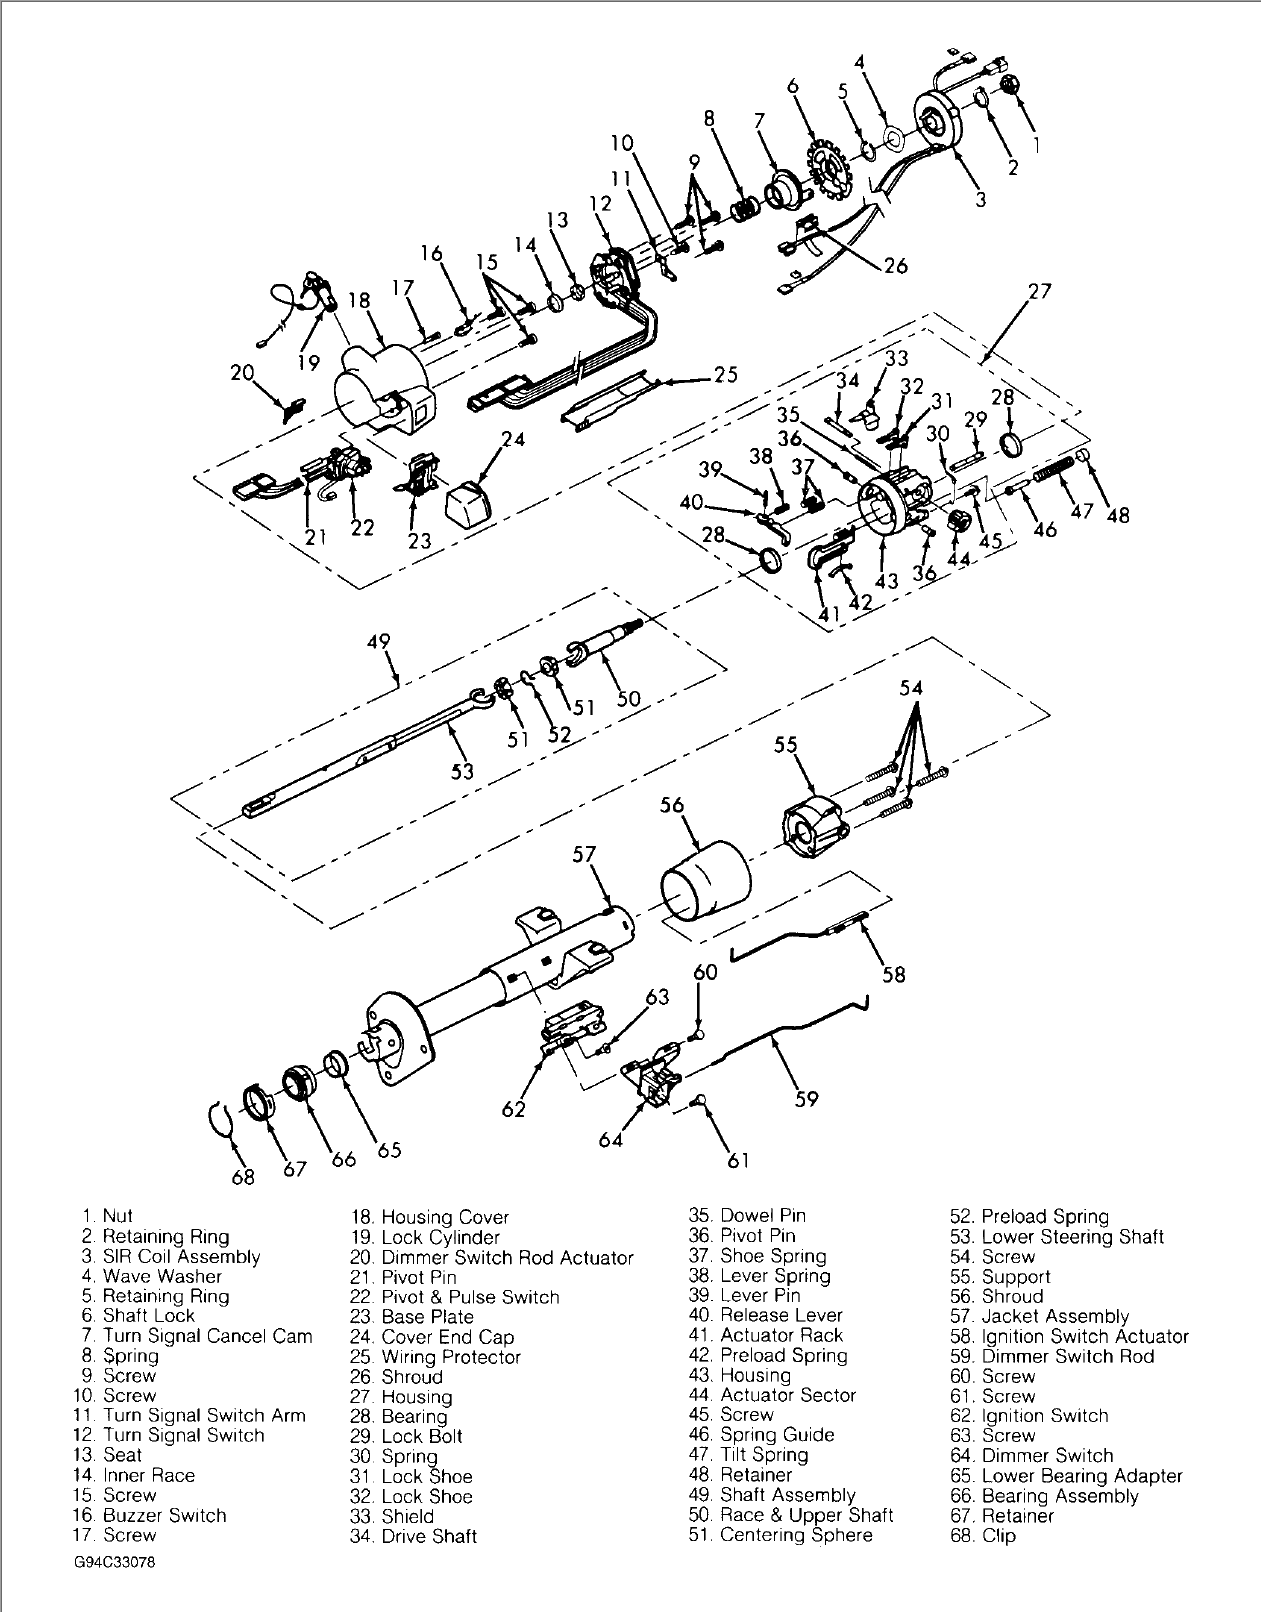 67 Camaro Steering Column Wiring Diagrams Wiring Diagram Local A Local A Maceratadoc It